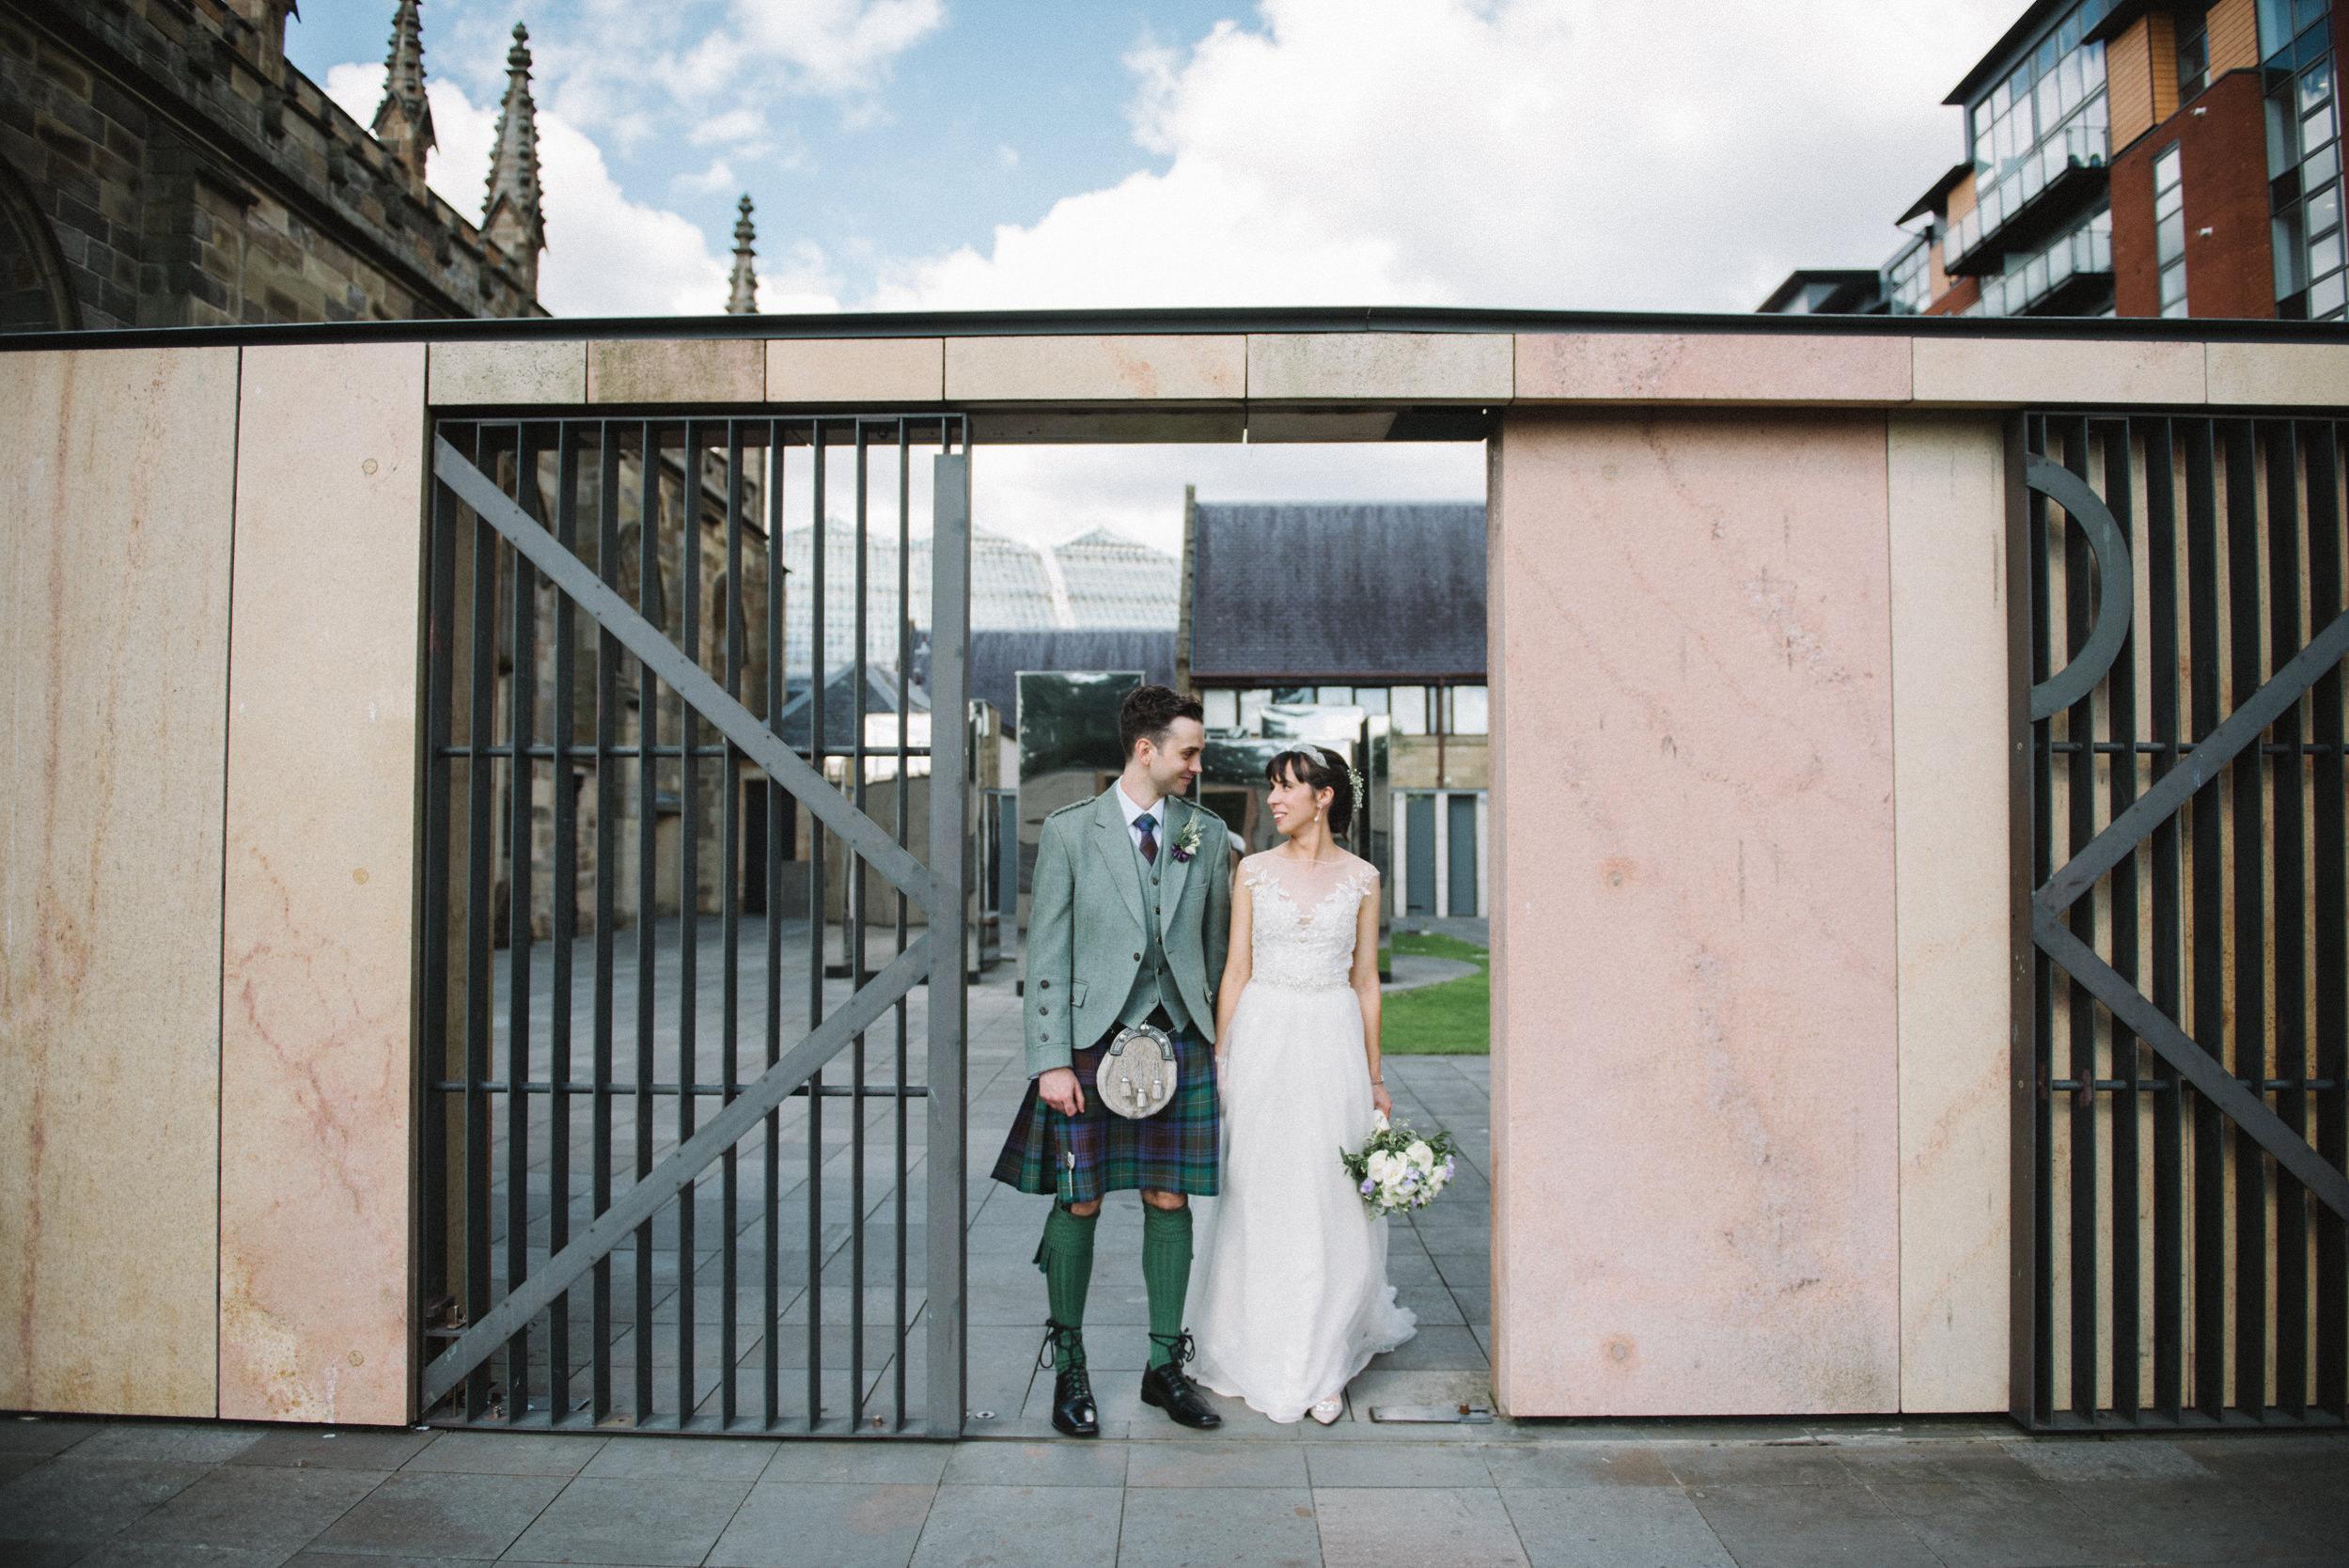 0096-alternative-wedding-portrait-family-kids-photographer-glasgow-scotland.JPG